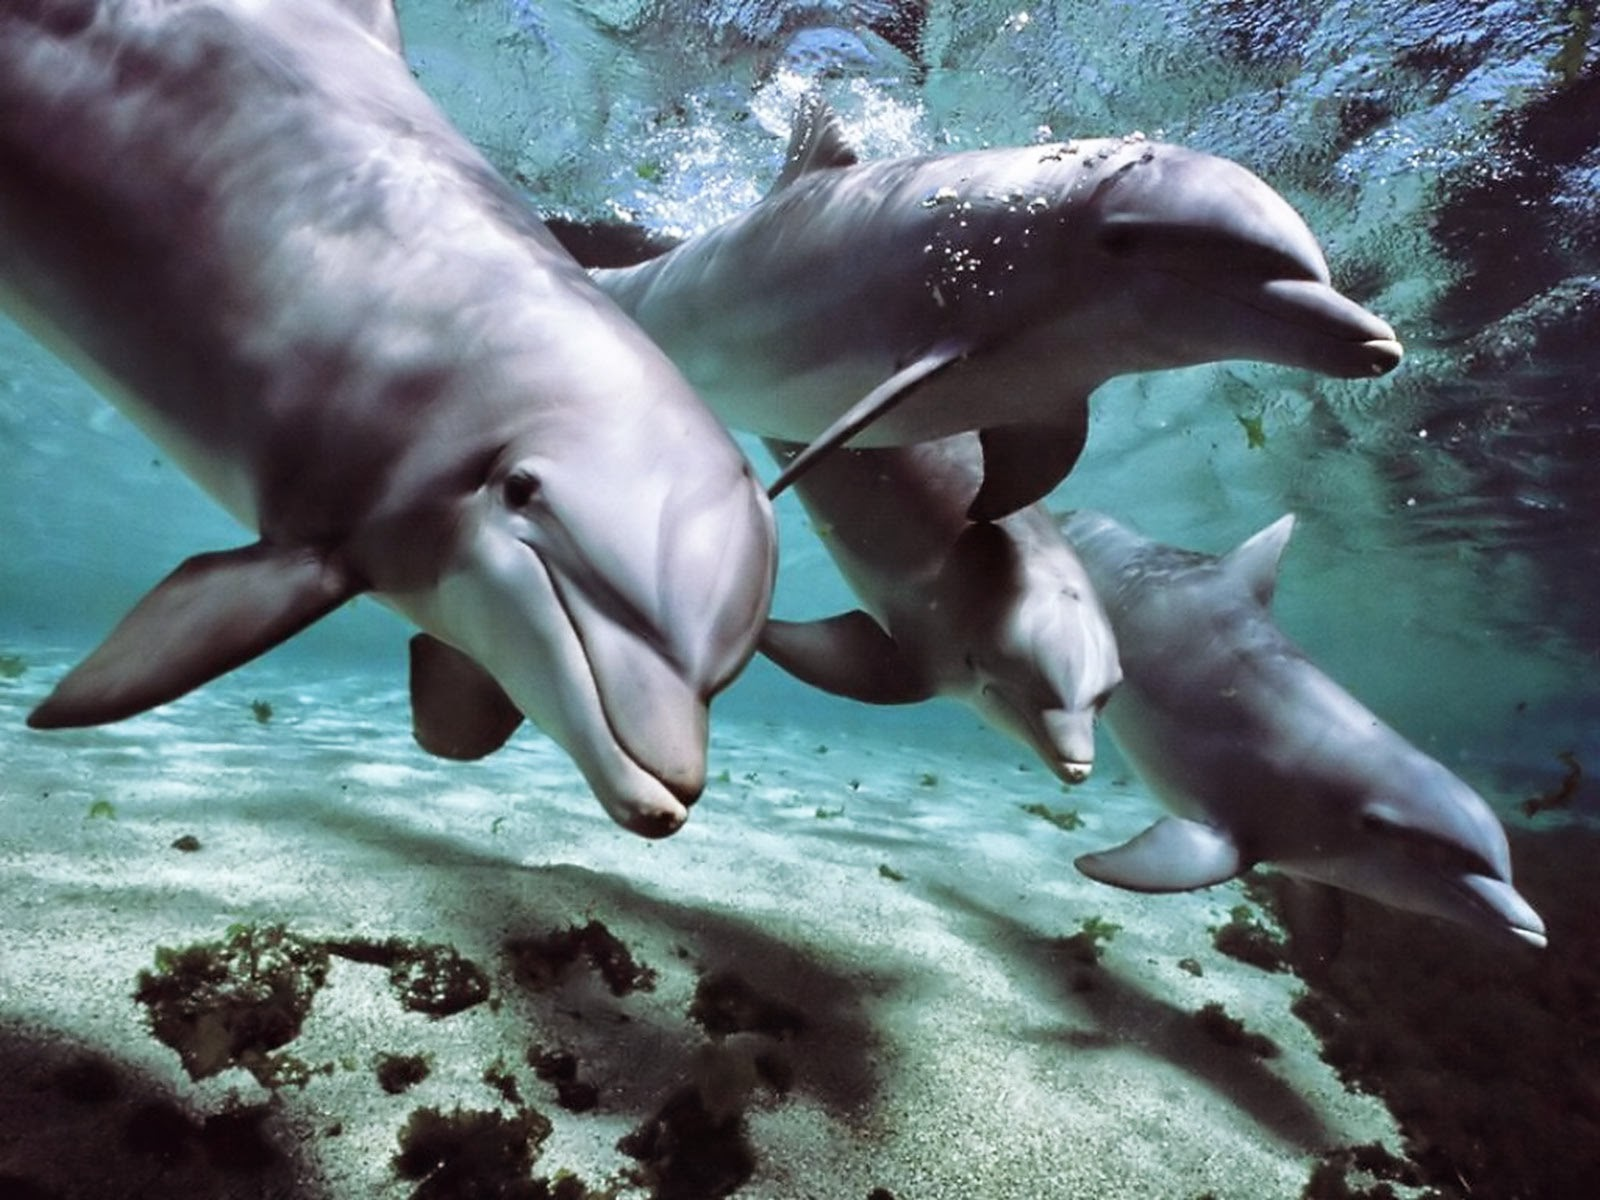 Sea creature porn nudes clip